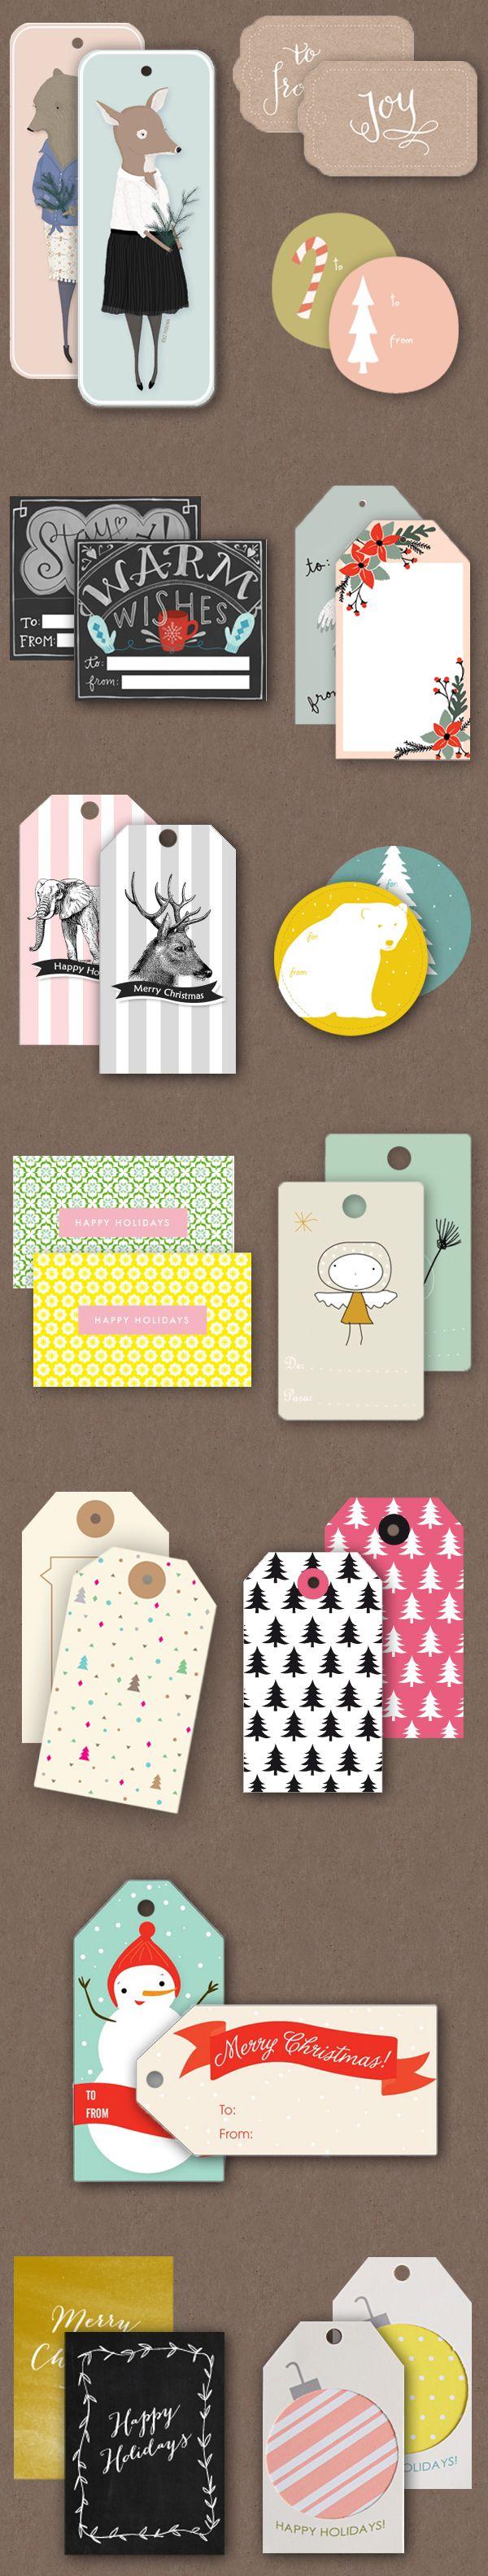 Etiquetas de regalo imprimibles gratis  -  Free printable gift tags